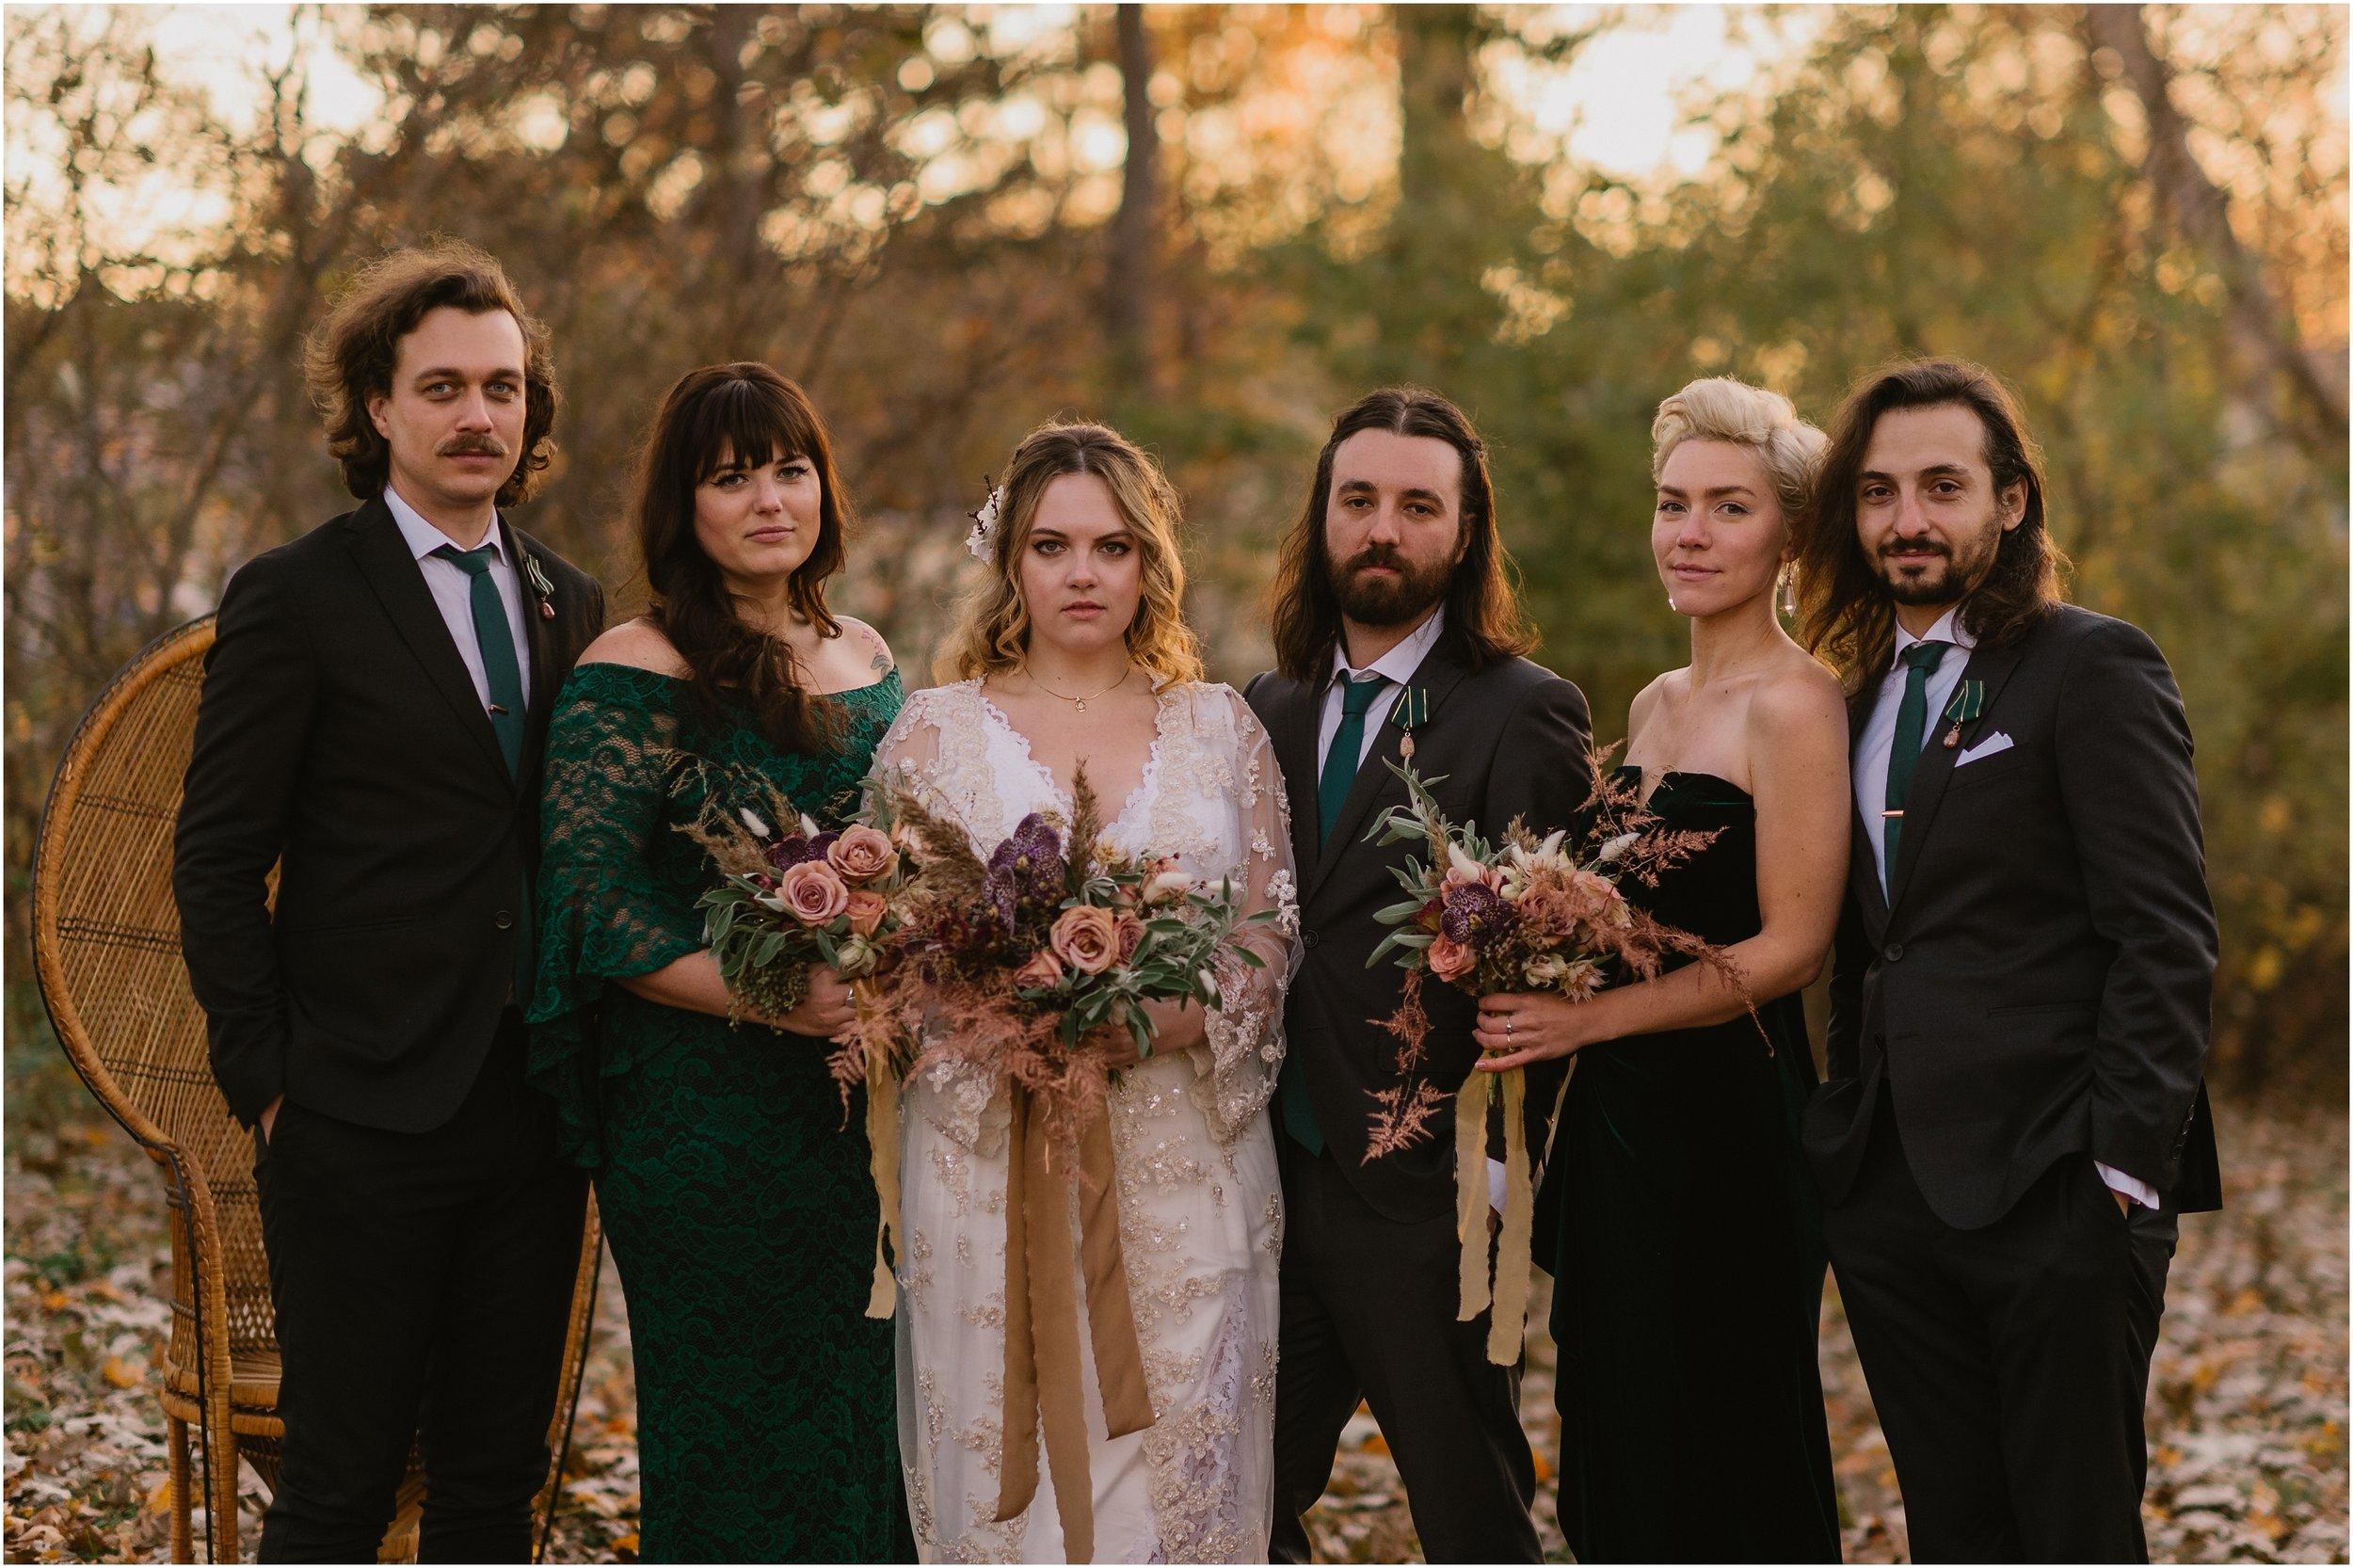 Rebecca_Shehorn_Photography_Indianapolis_Wedding_Photographer_9436.jpg